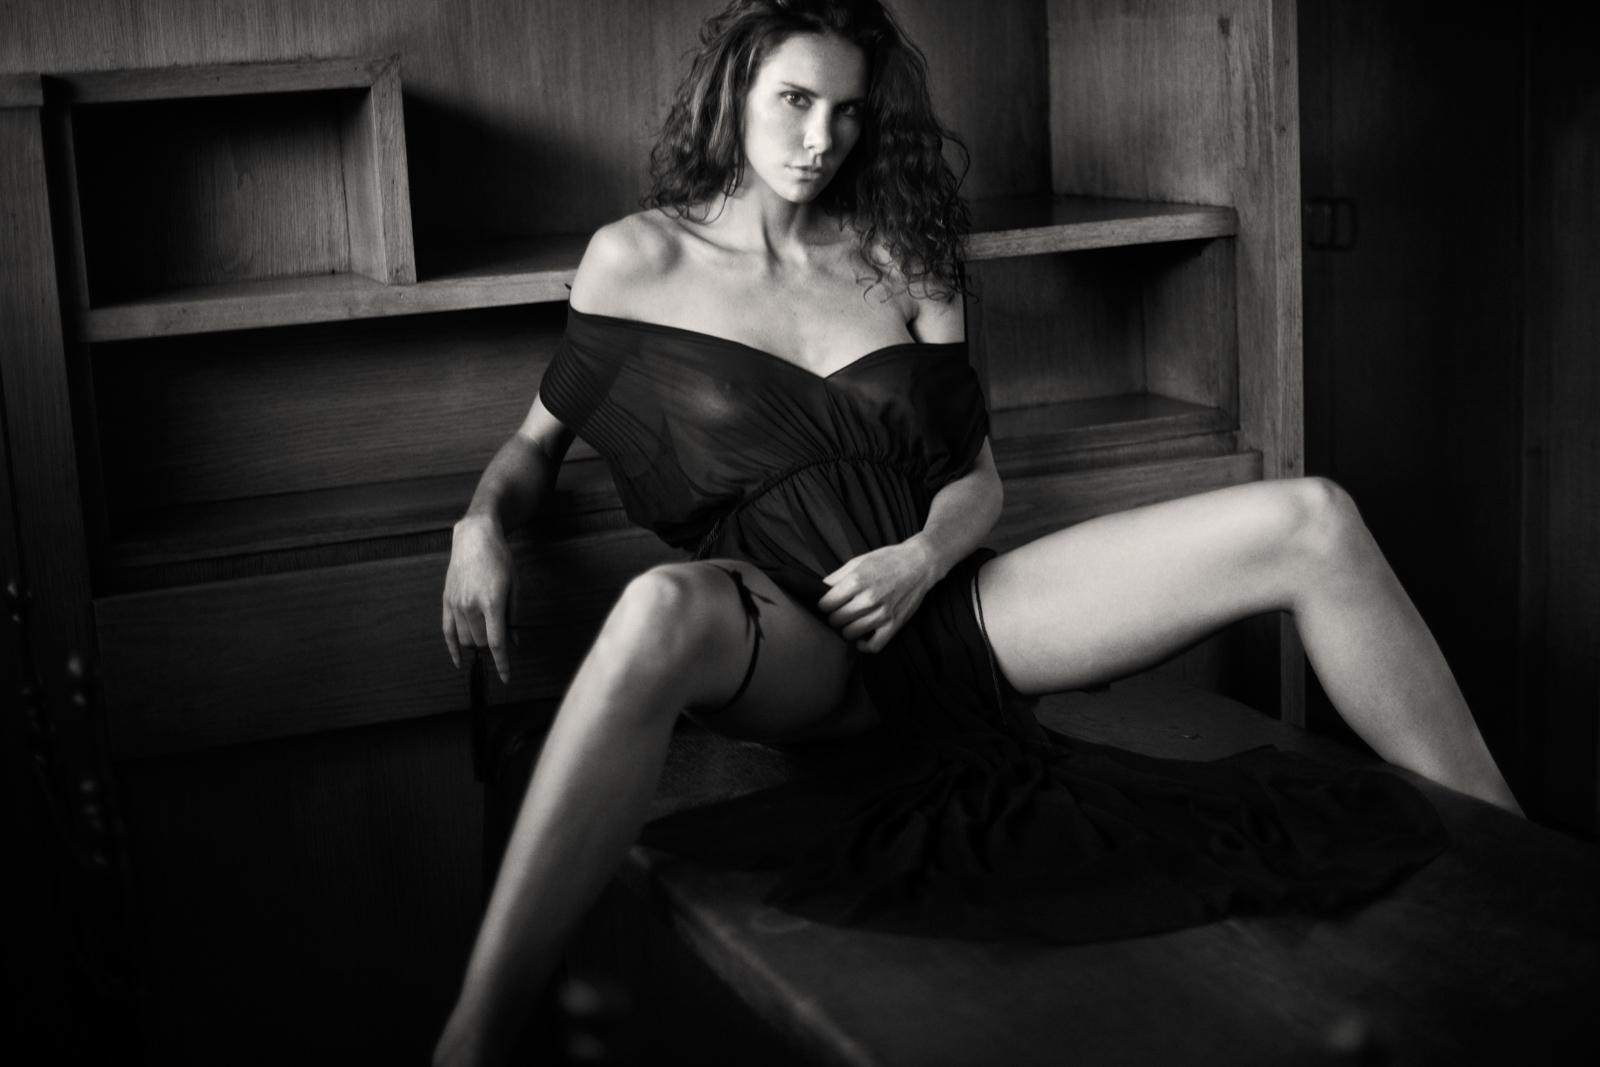 Andja Lorein Nude Art model